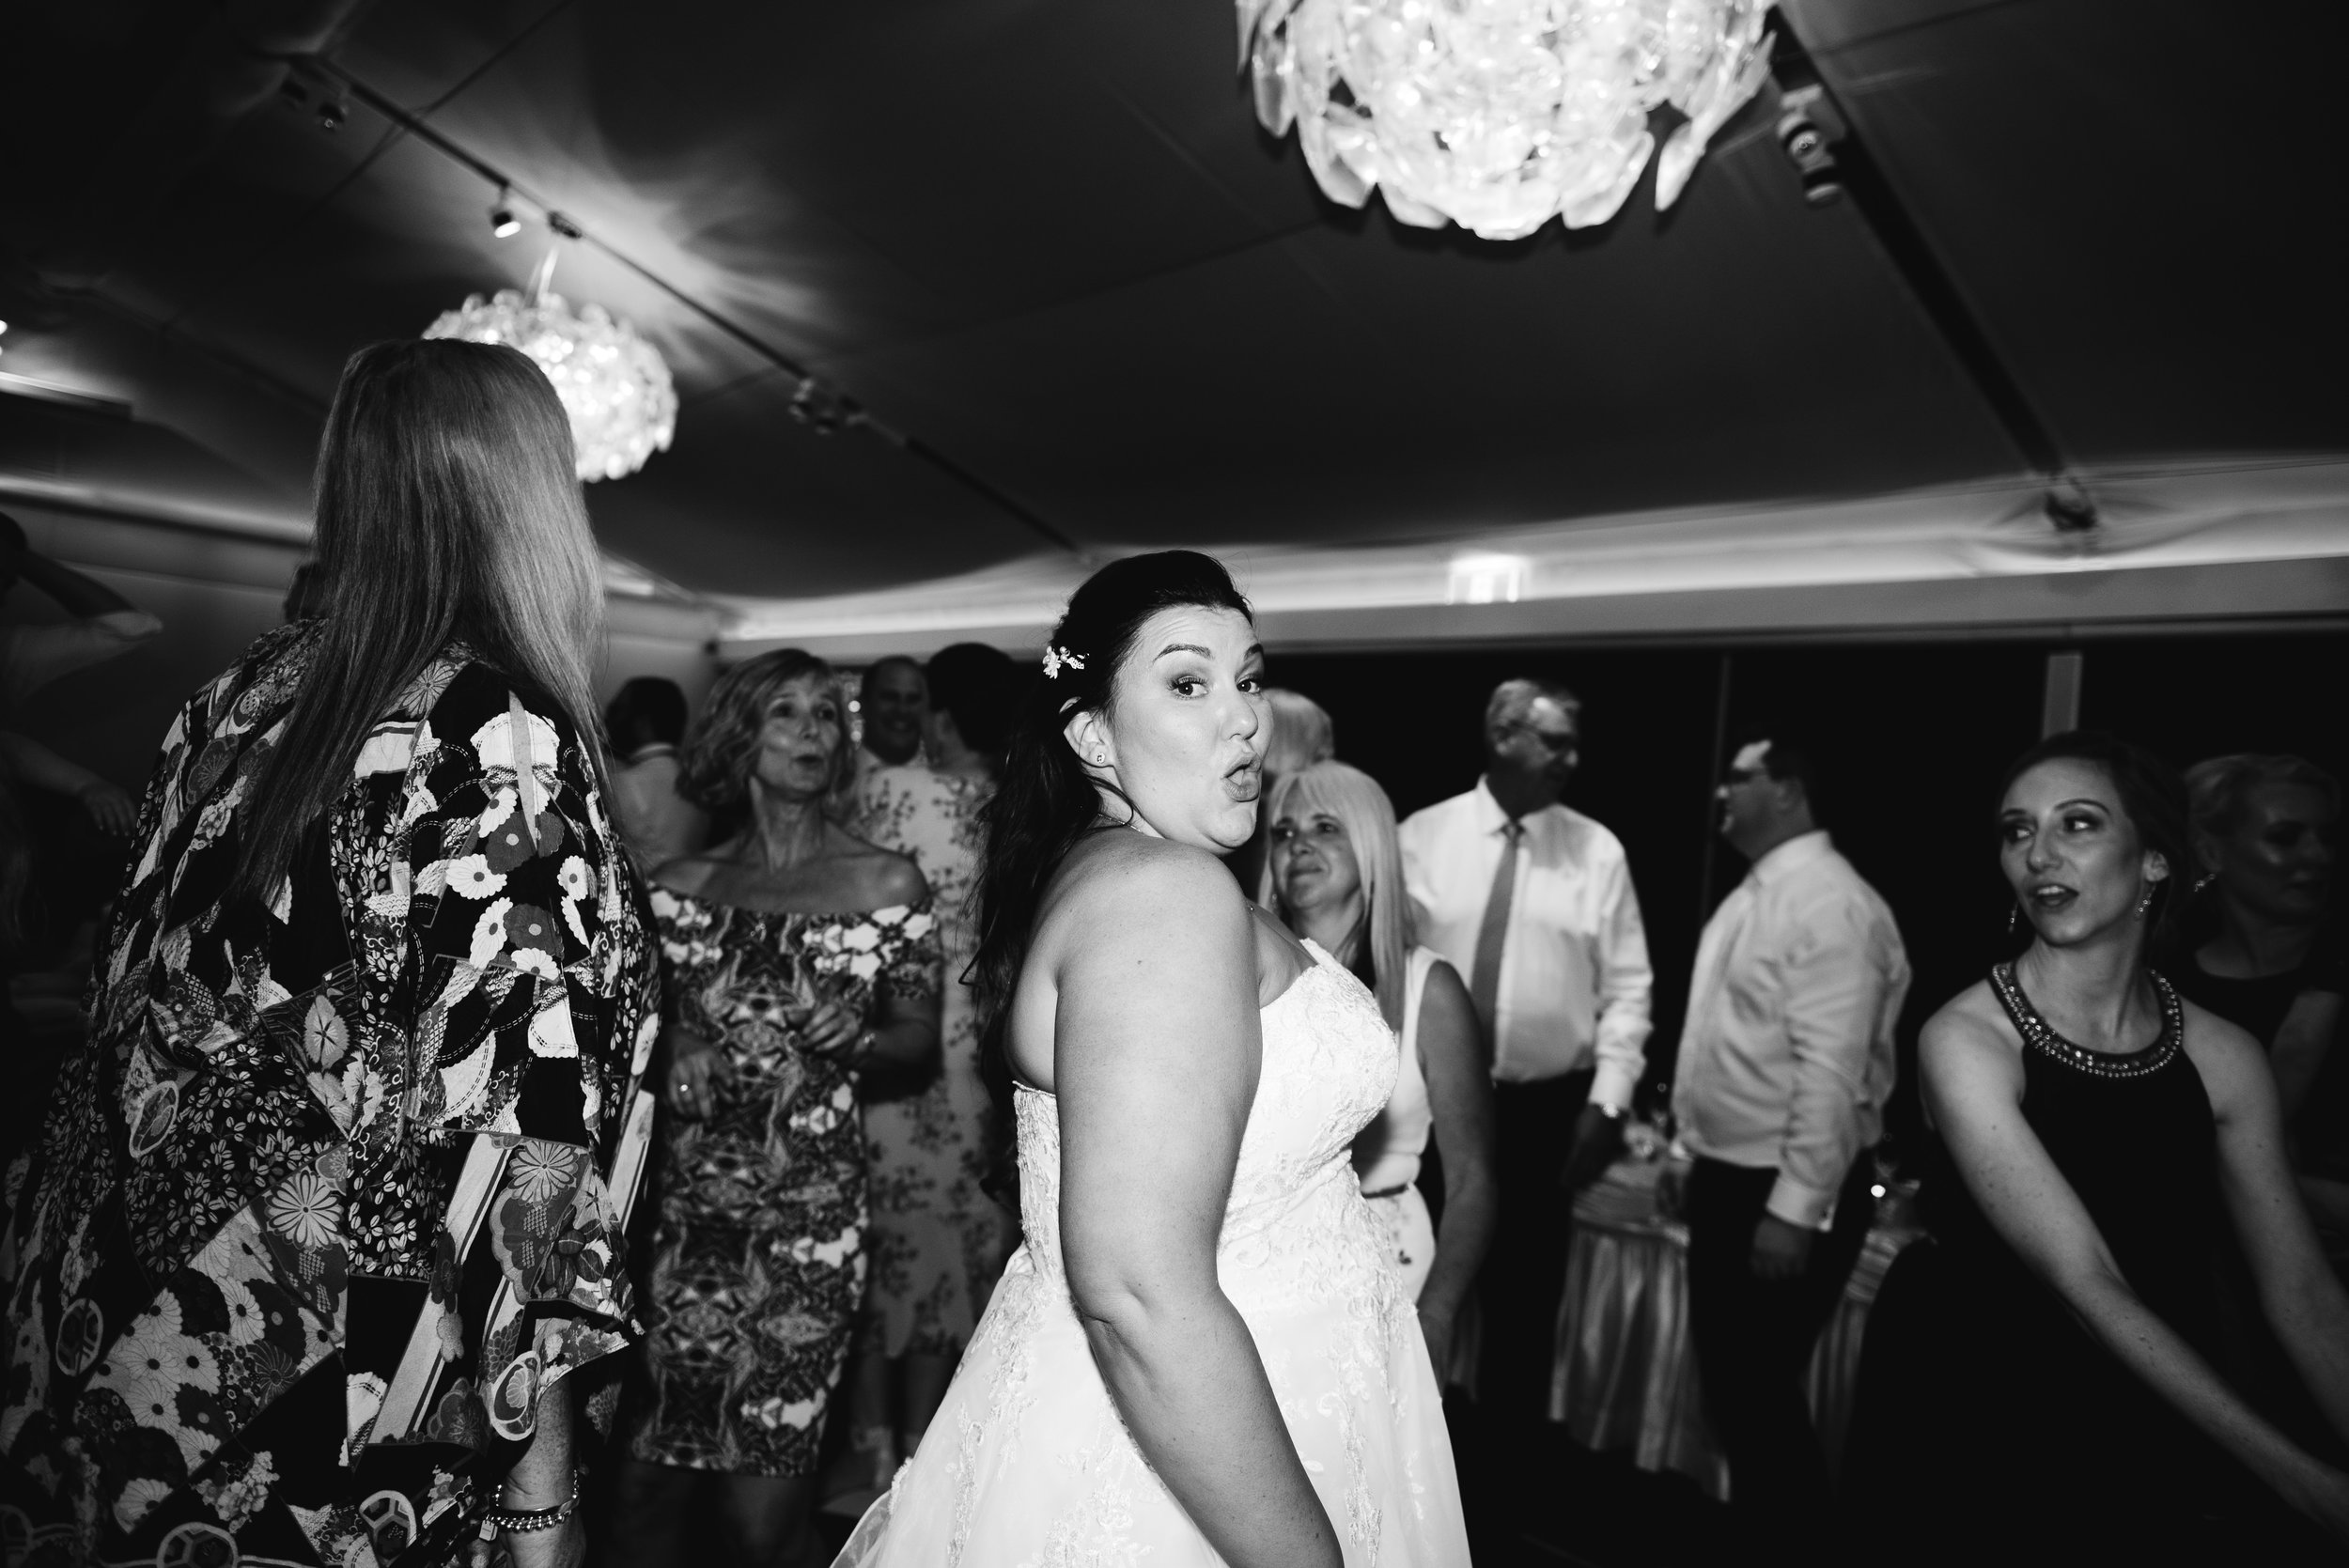 brisbane-wedding-photographer-132.jpg